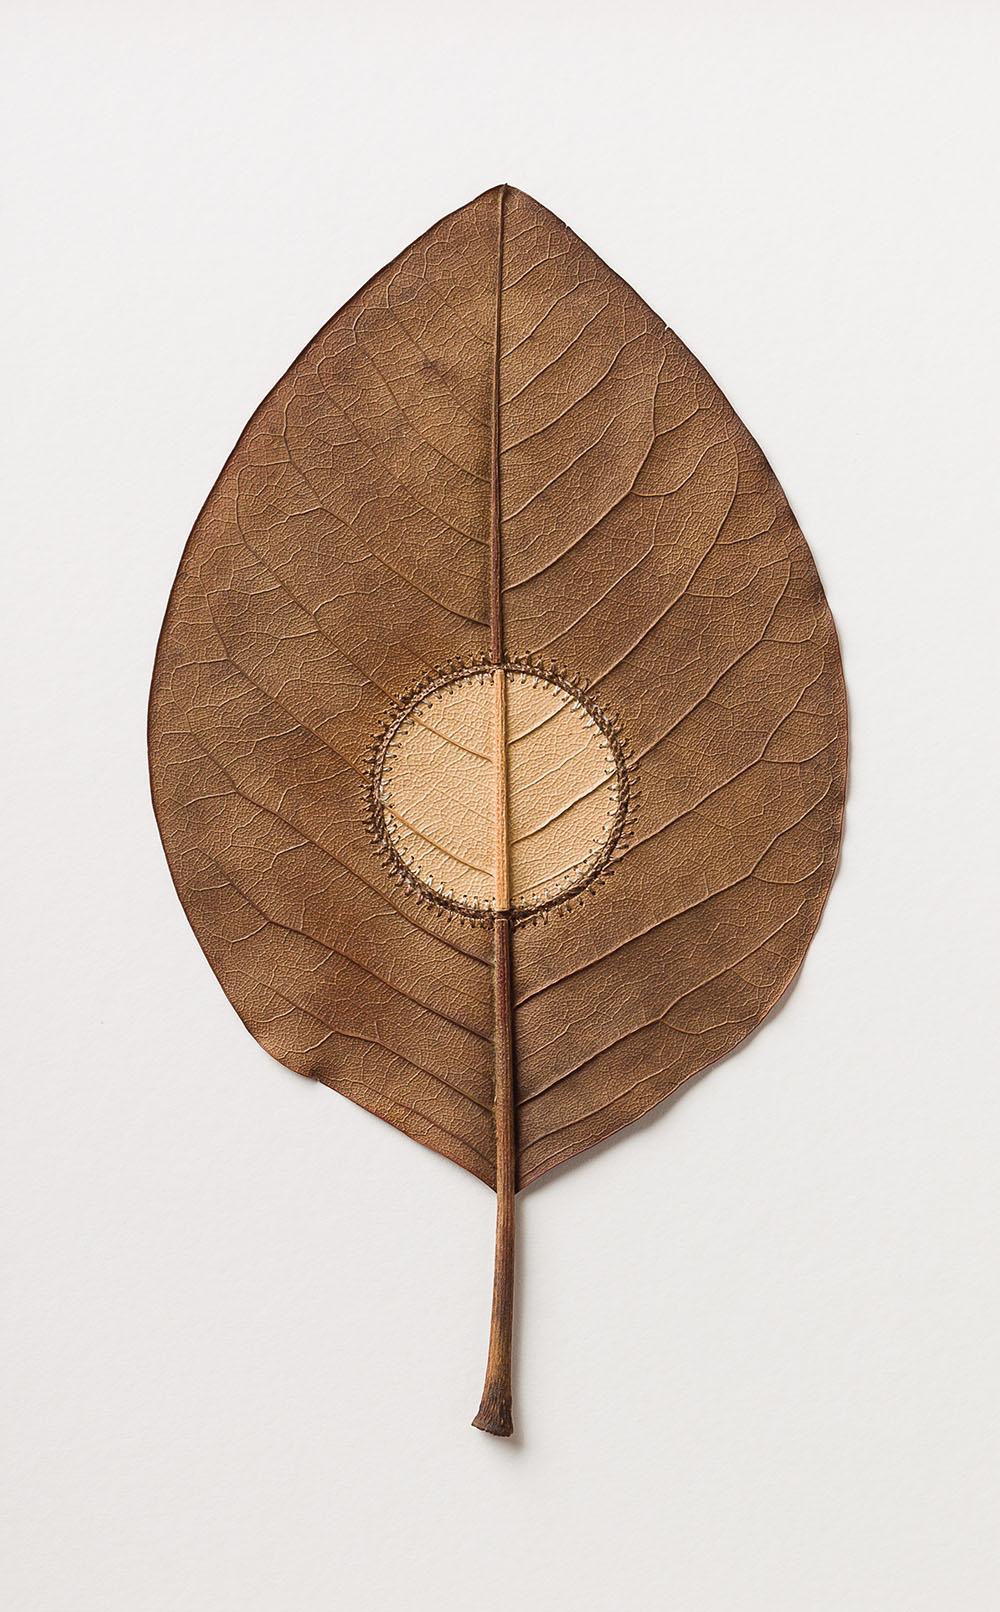 Inner Circle. 35.8 H x 25.8 W cm. Magnolia leaves, cotton yarn.